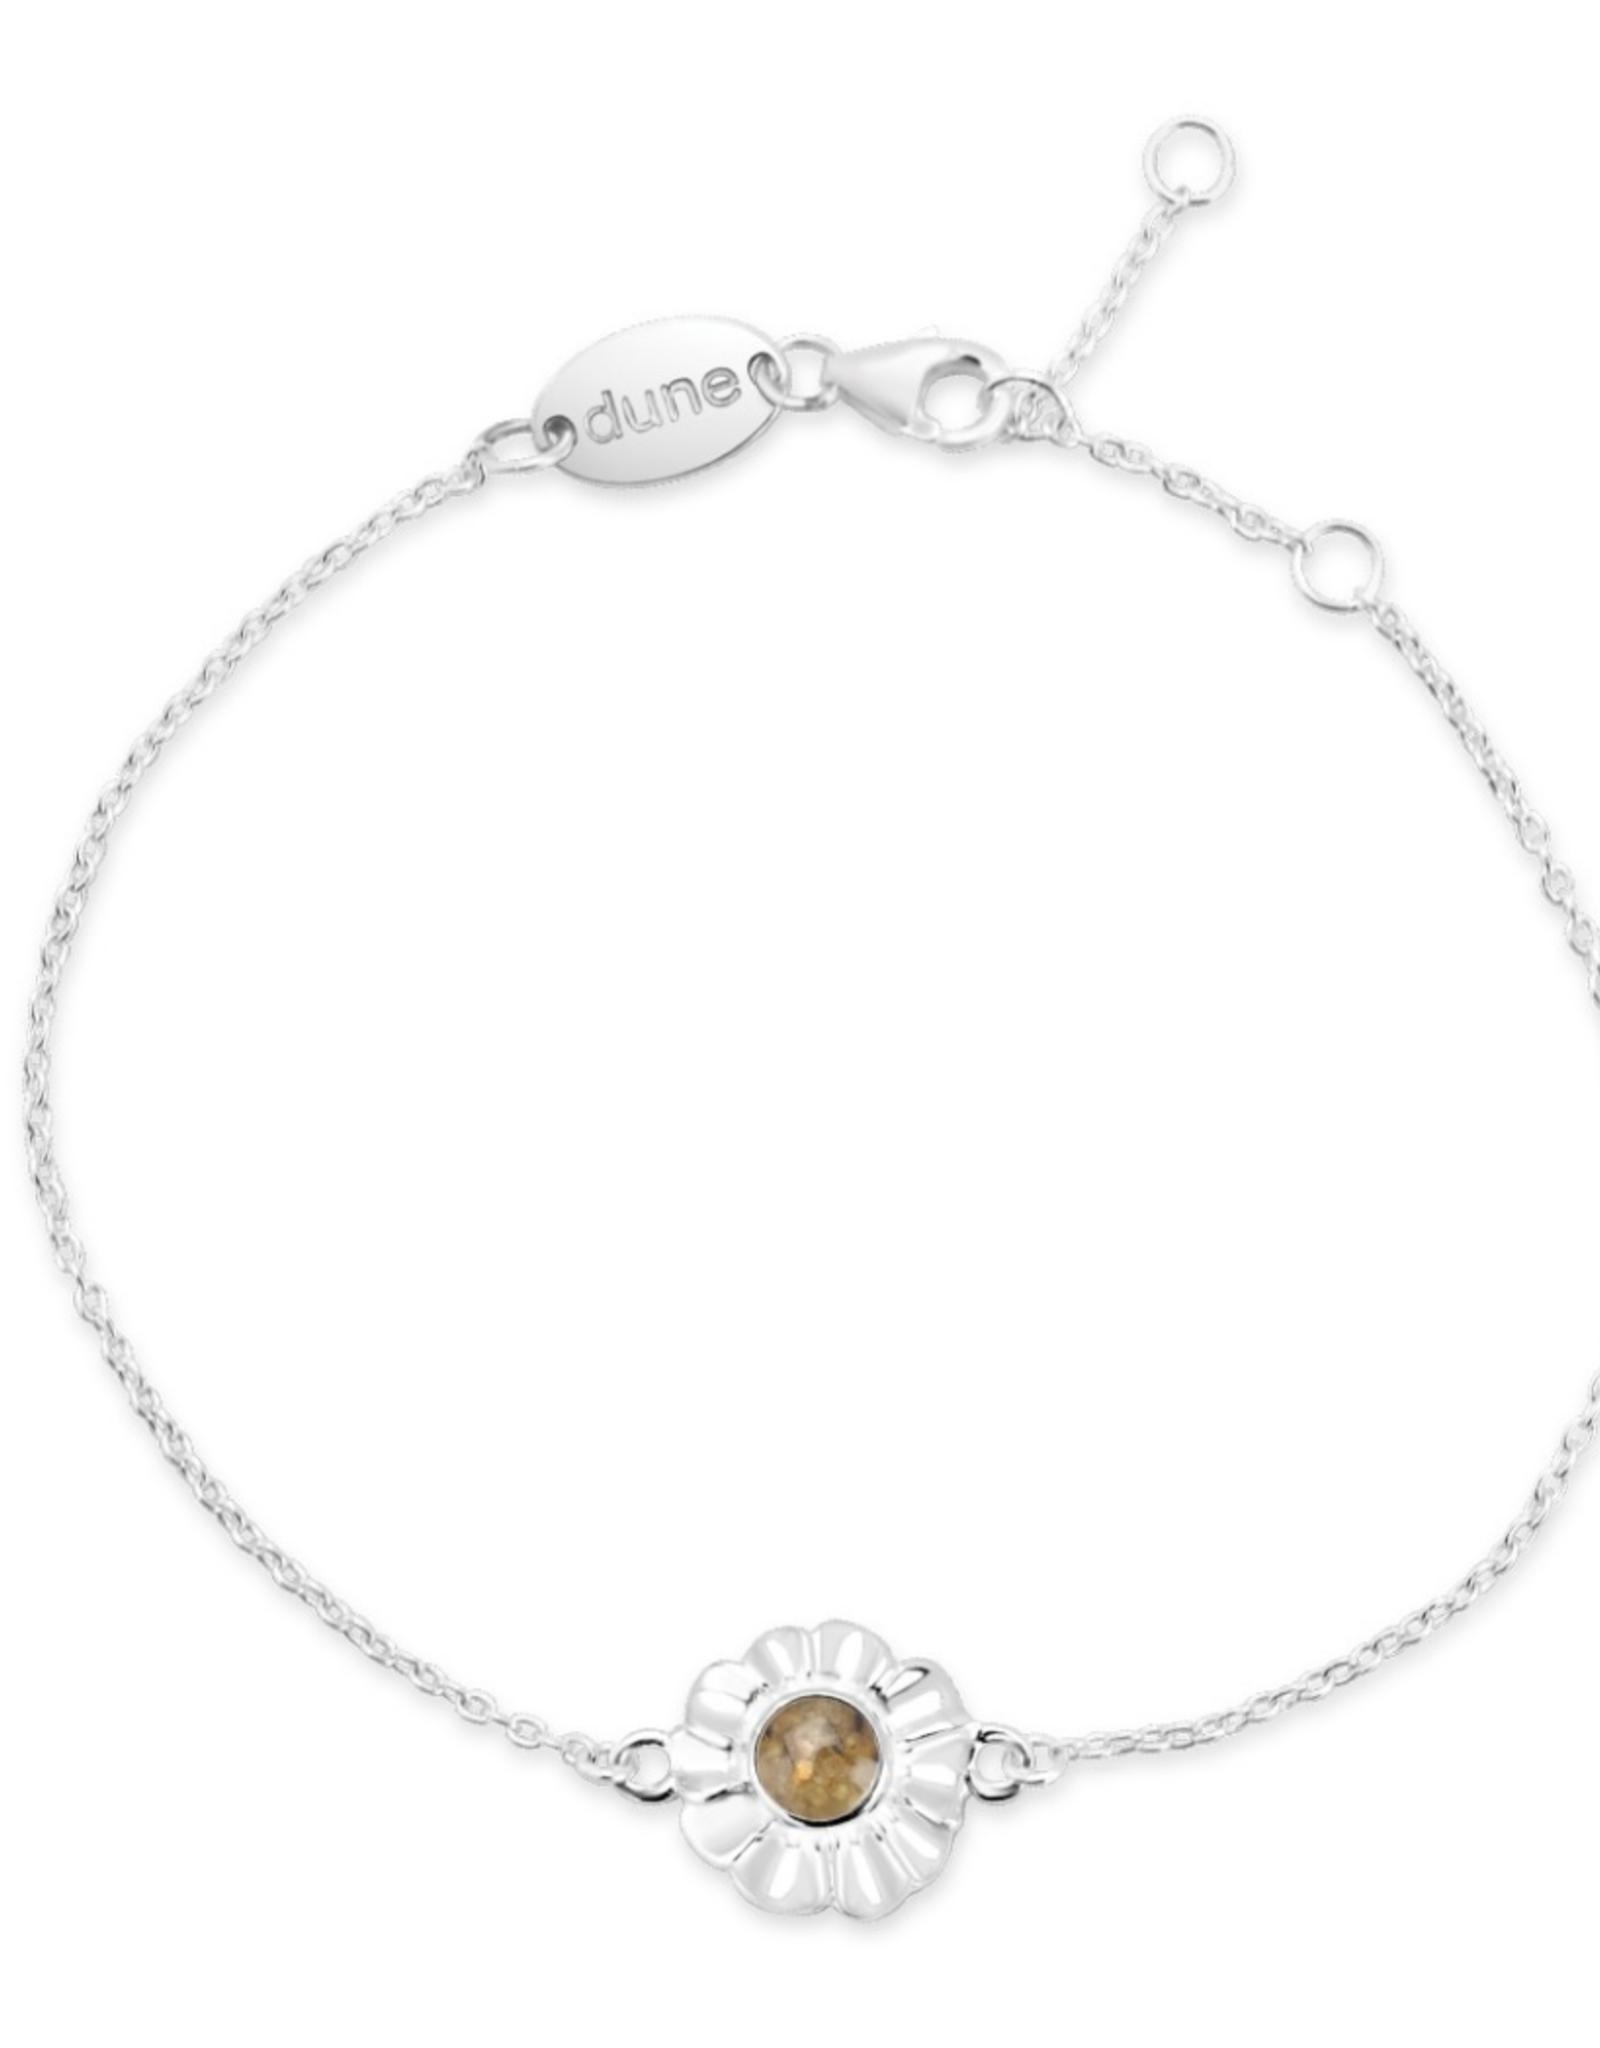 Dune Jewelry Dune Jewelry - Delicate Dune Flower Bracelet Cape Cod